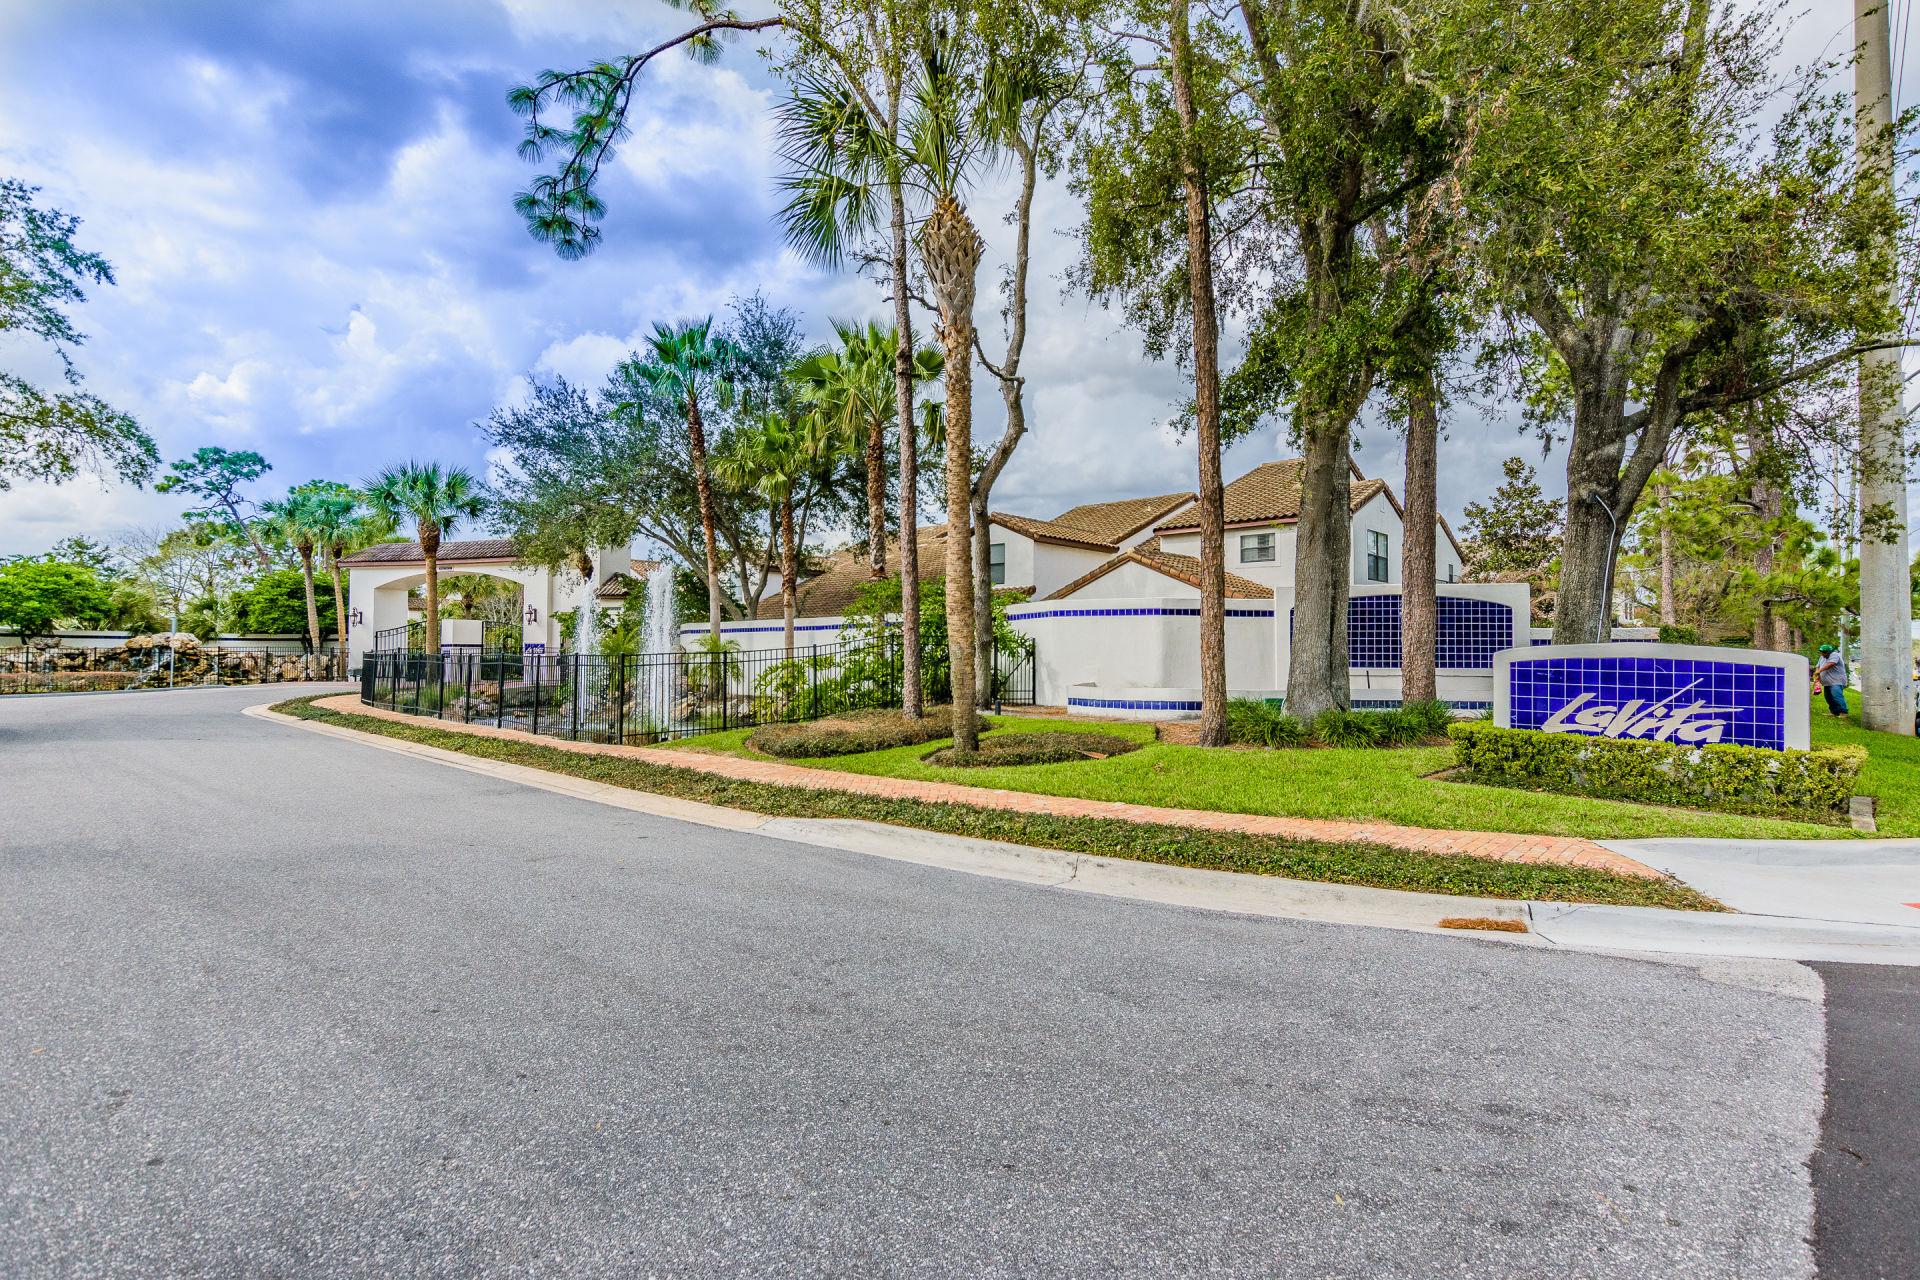 524 Via Verona Lane 202 Altamonte Springs FL – Coming Soon